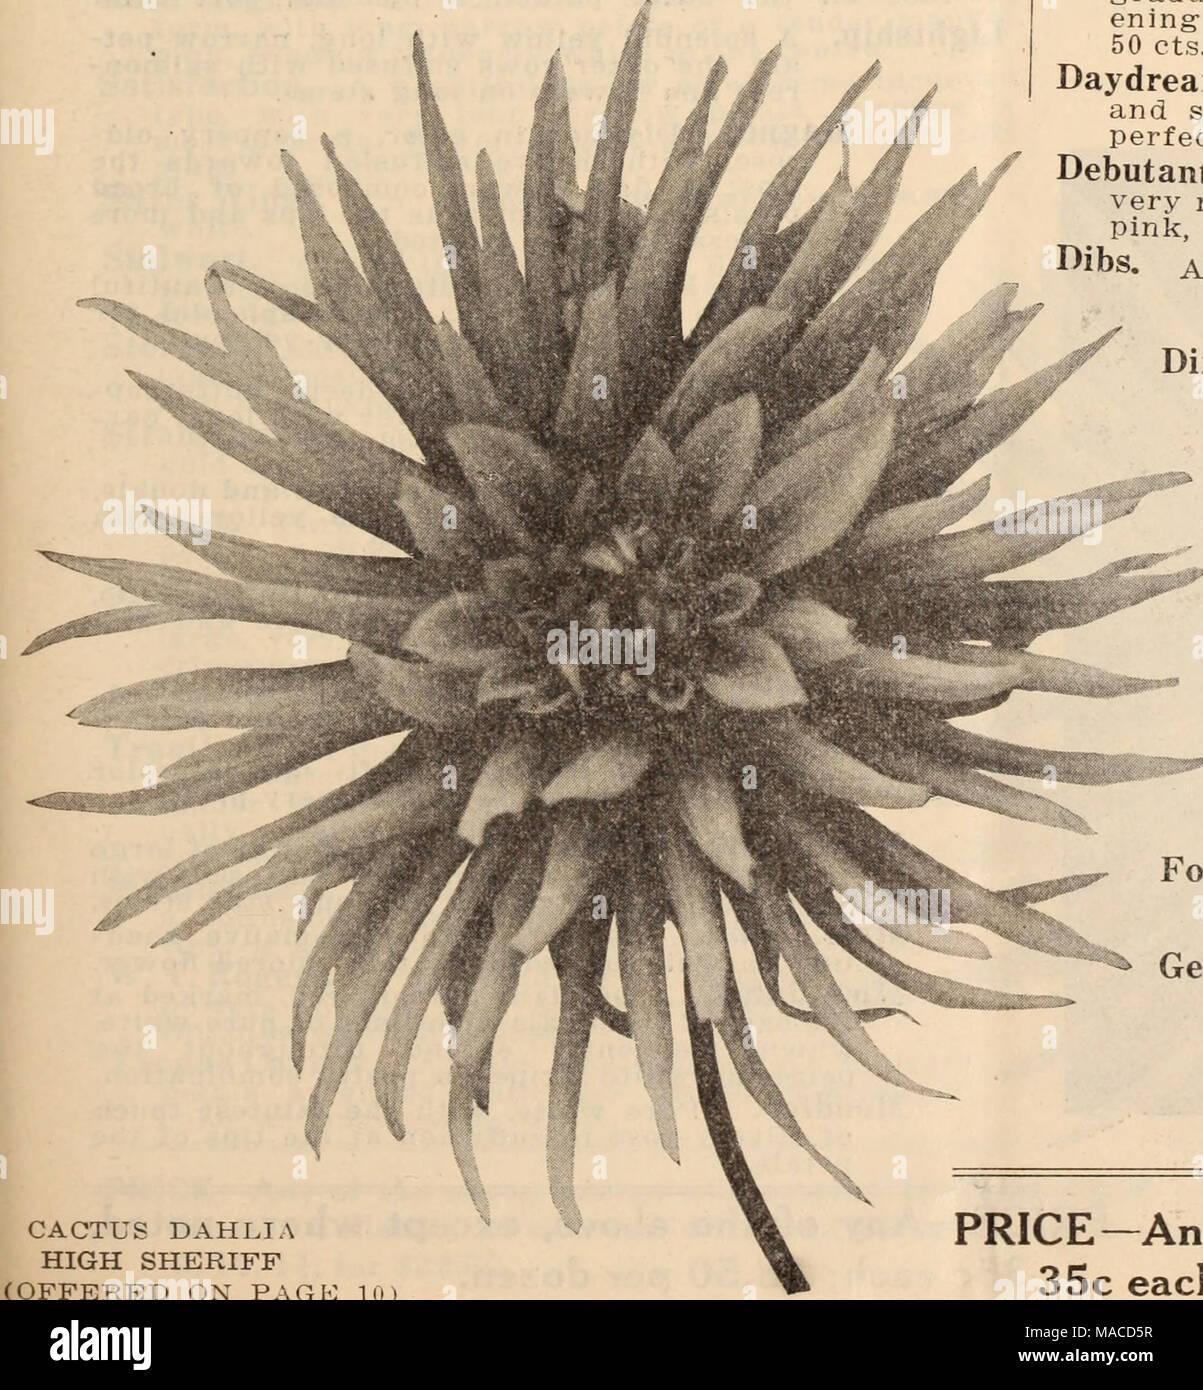 Dreers Wholesale Price List Henry A Dreer Cactus Dahlia High